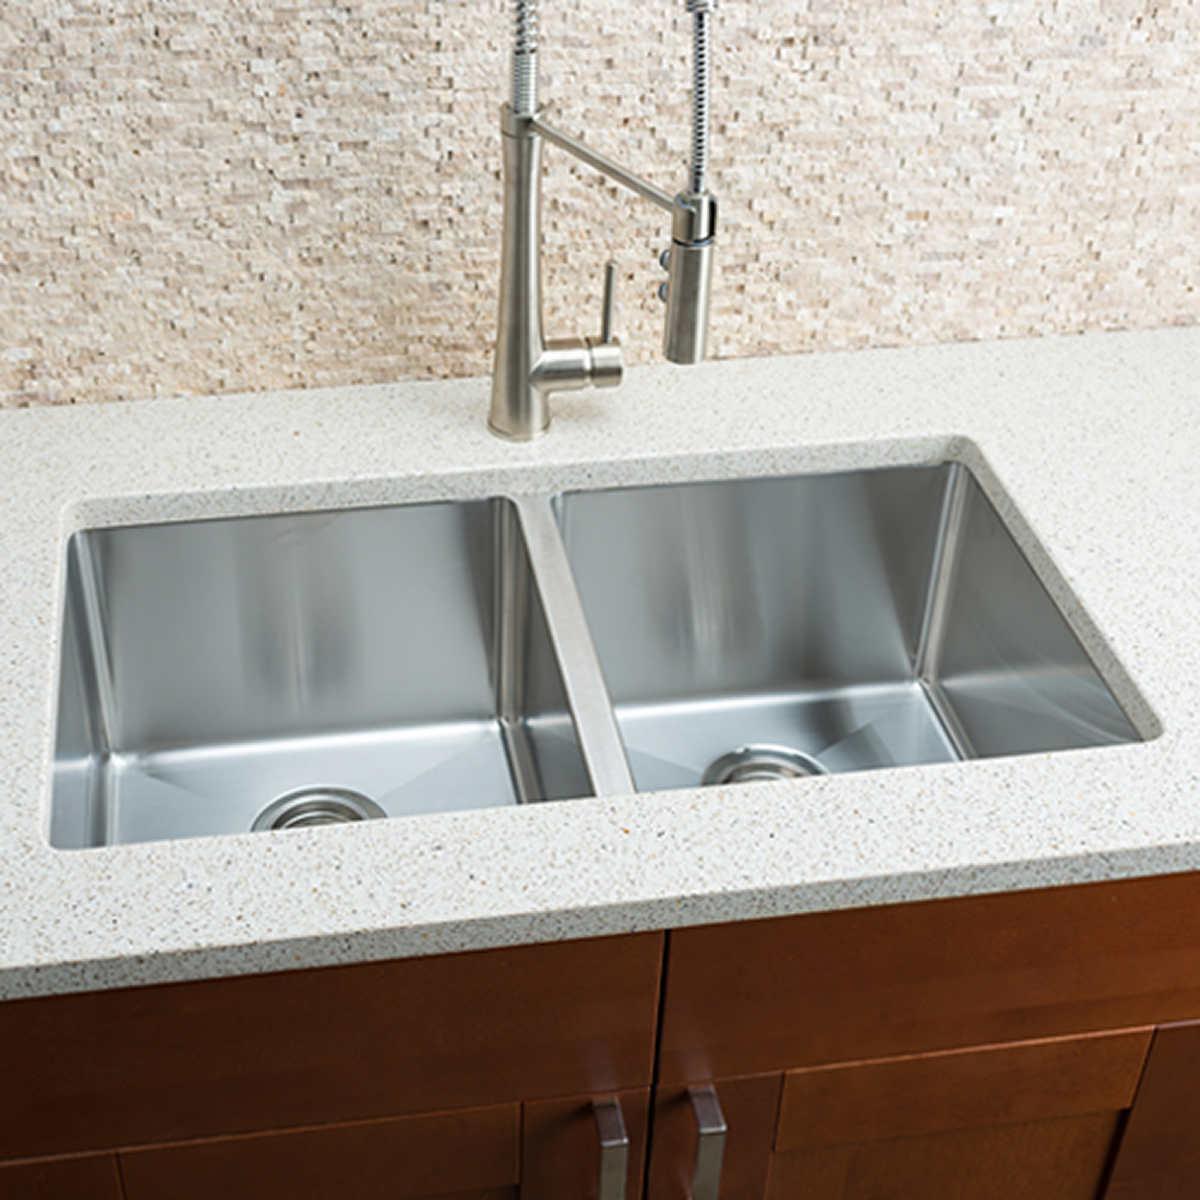 kitchen sinks | costco